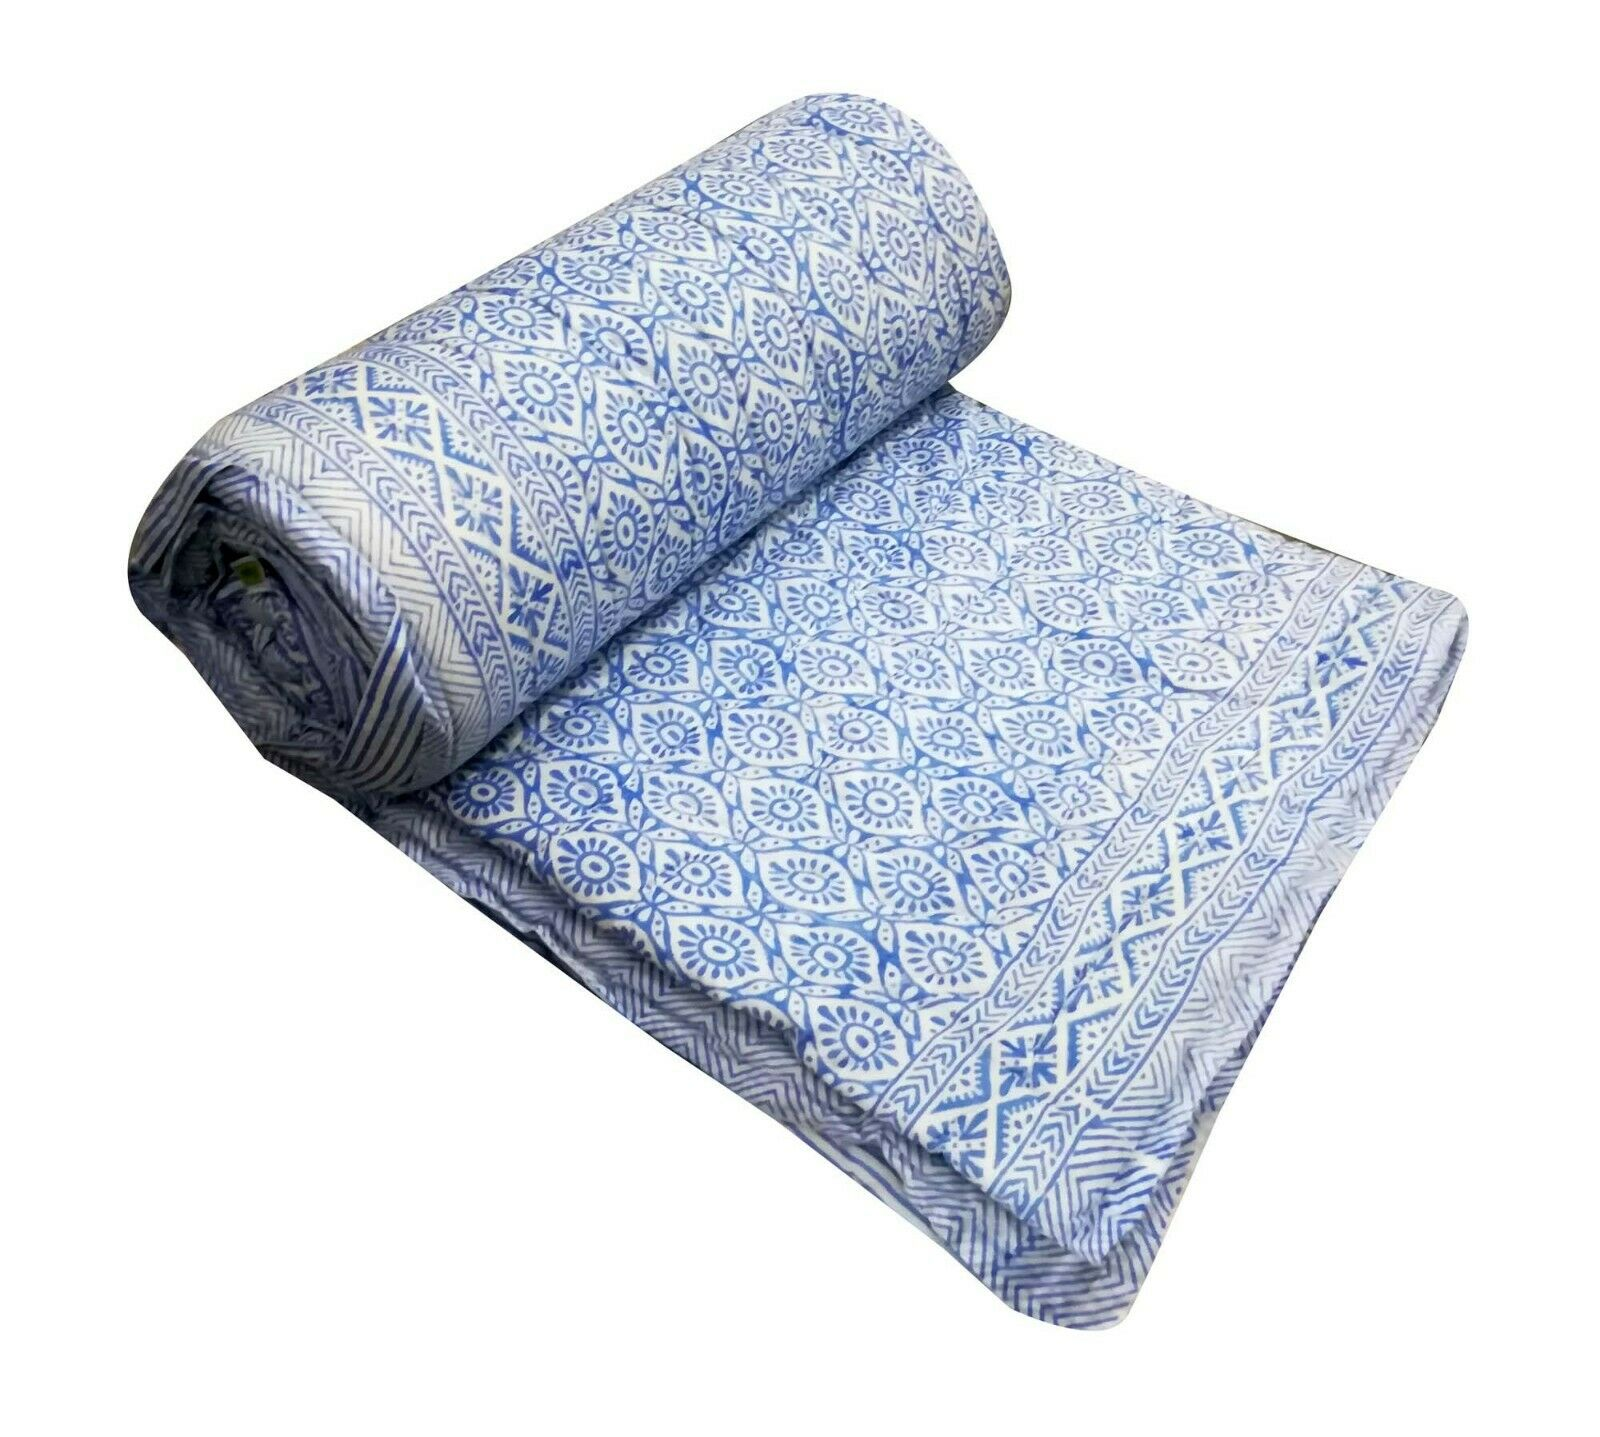 Indian HandBlock Ikat Print Kantha Quilt Cotton Bedspread Ki